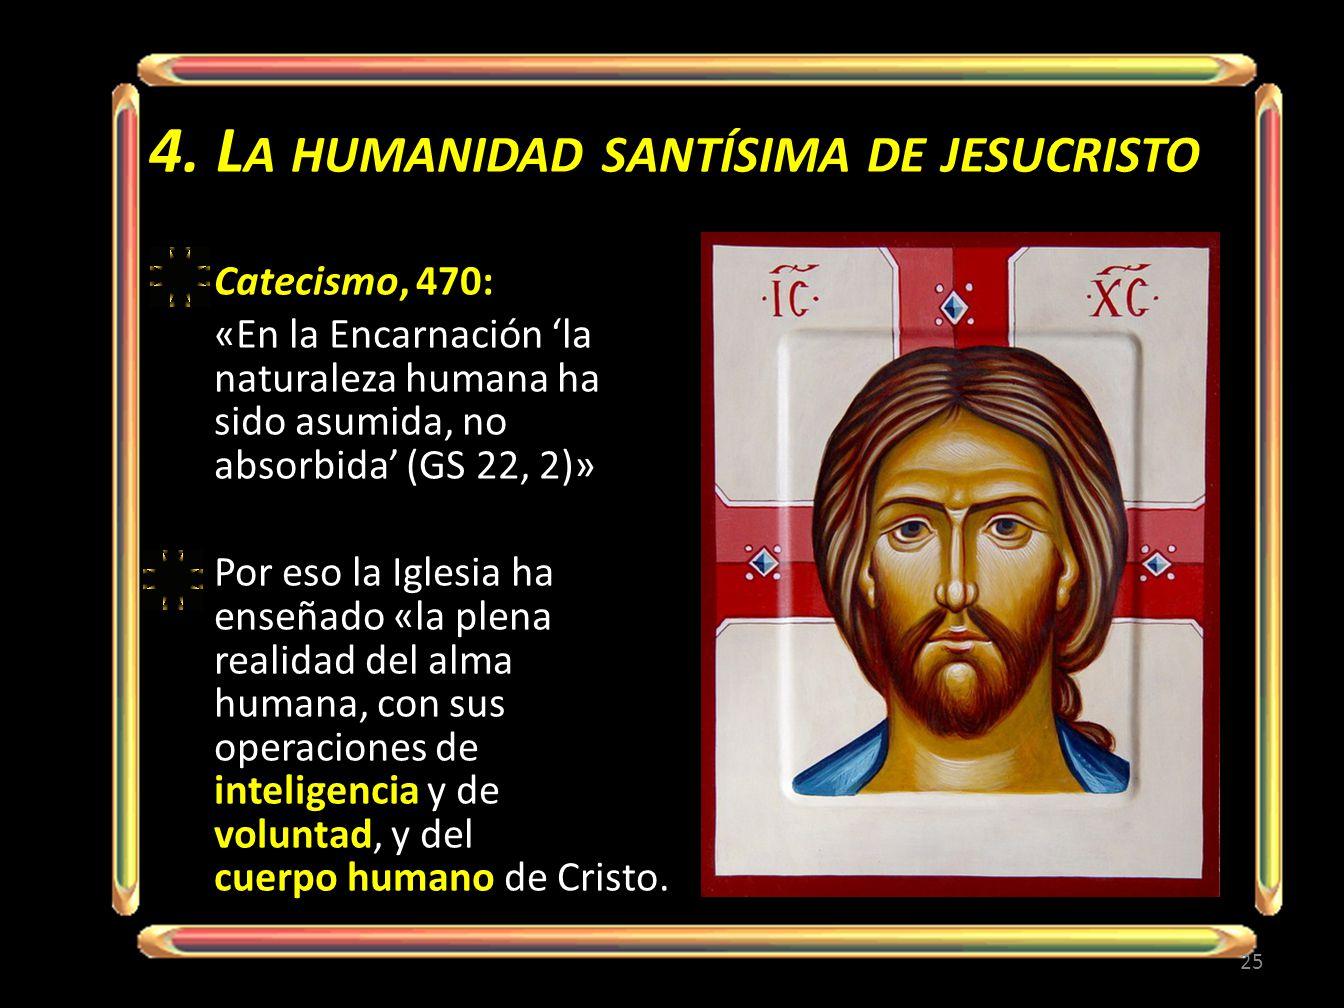 4. La humanidad santísima de jesucristo